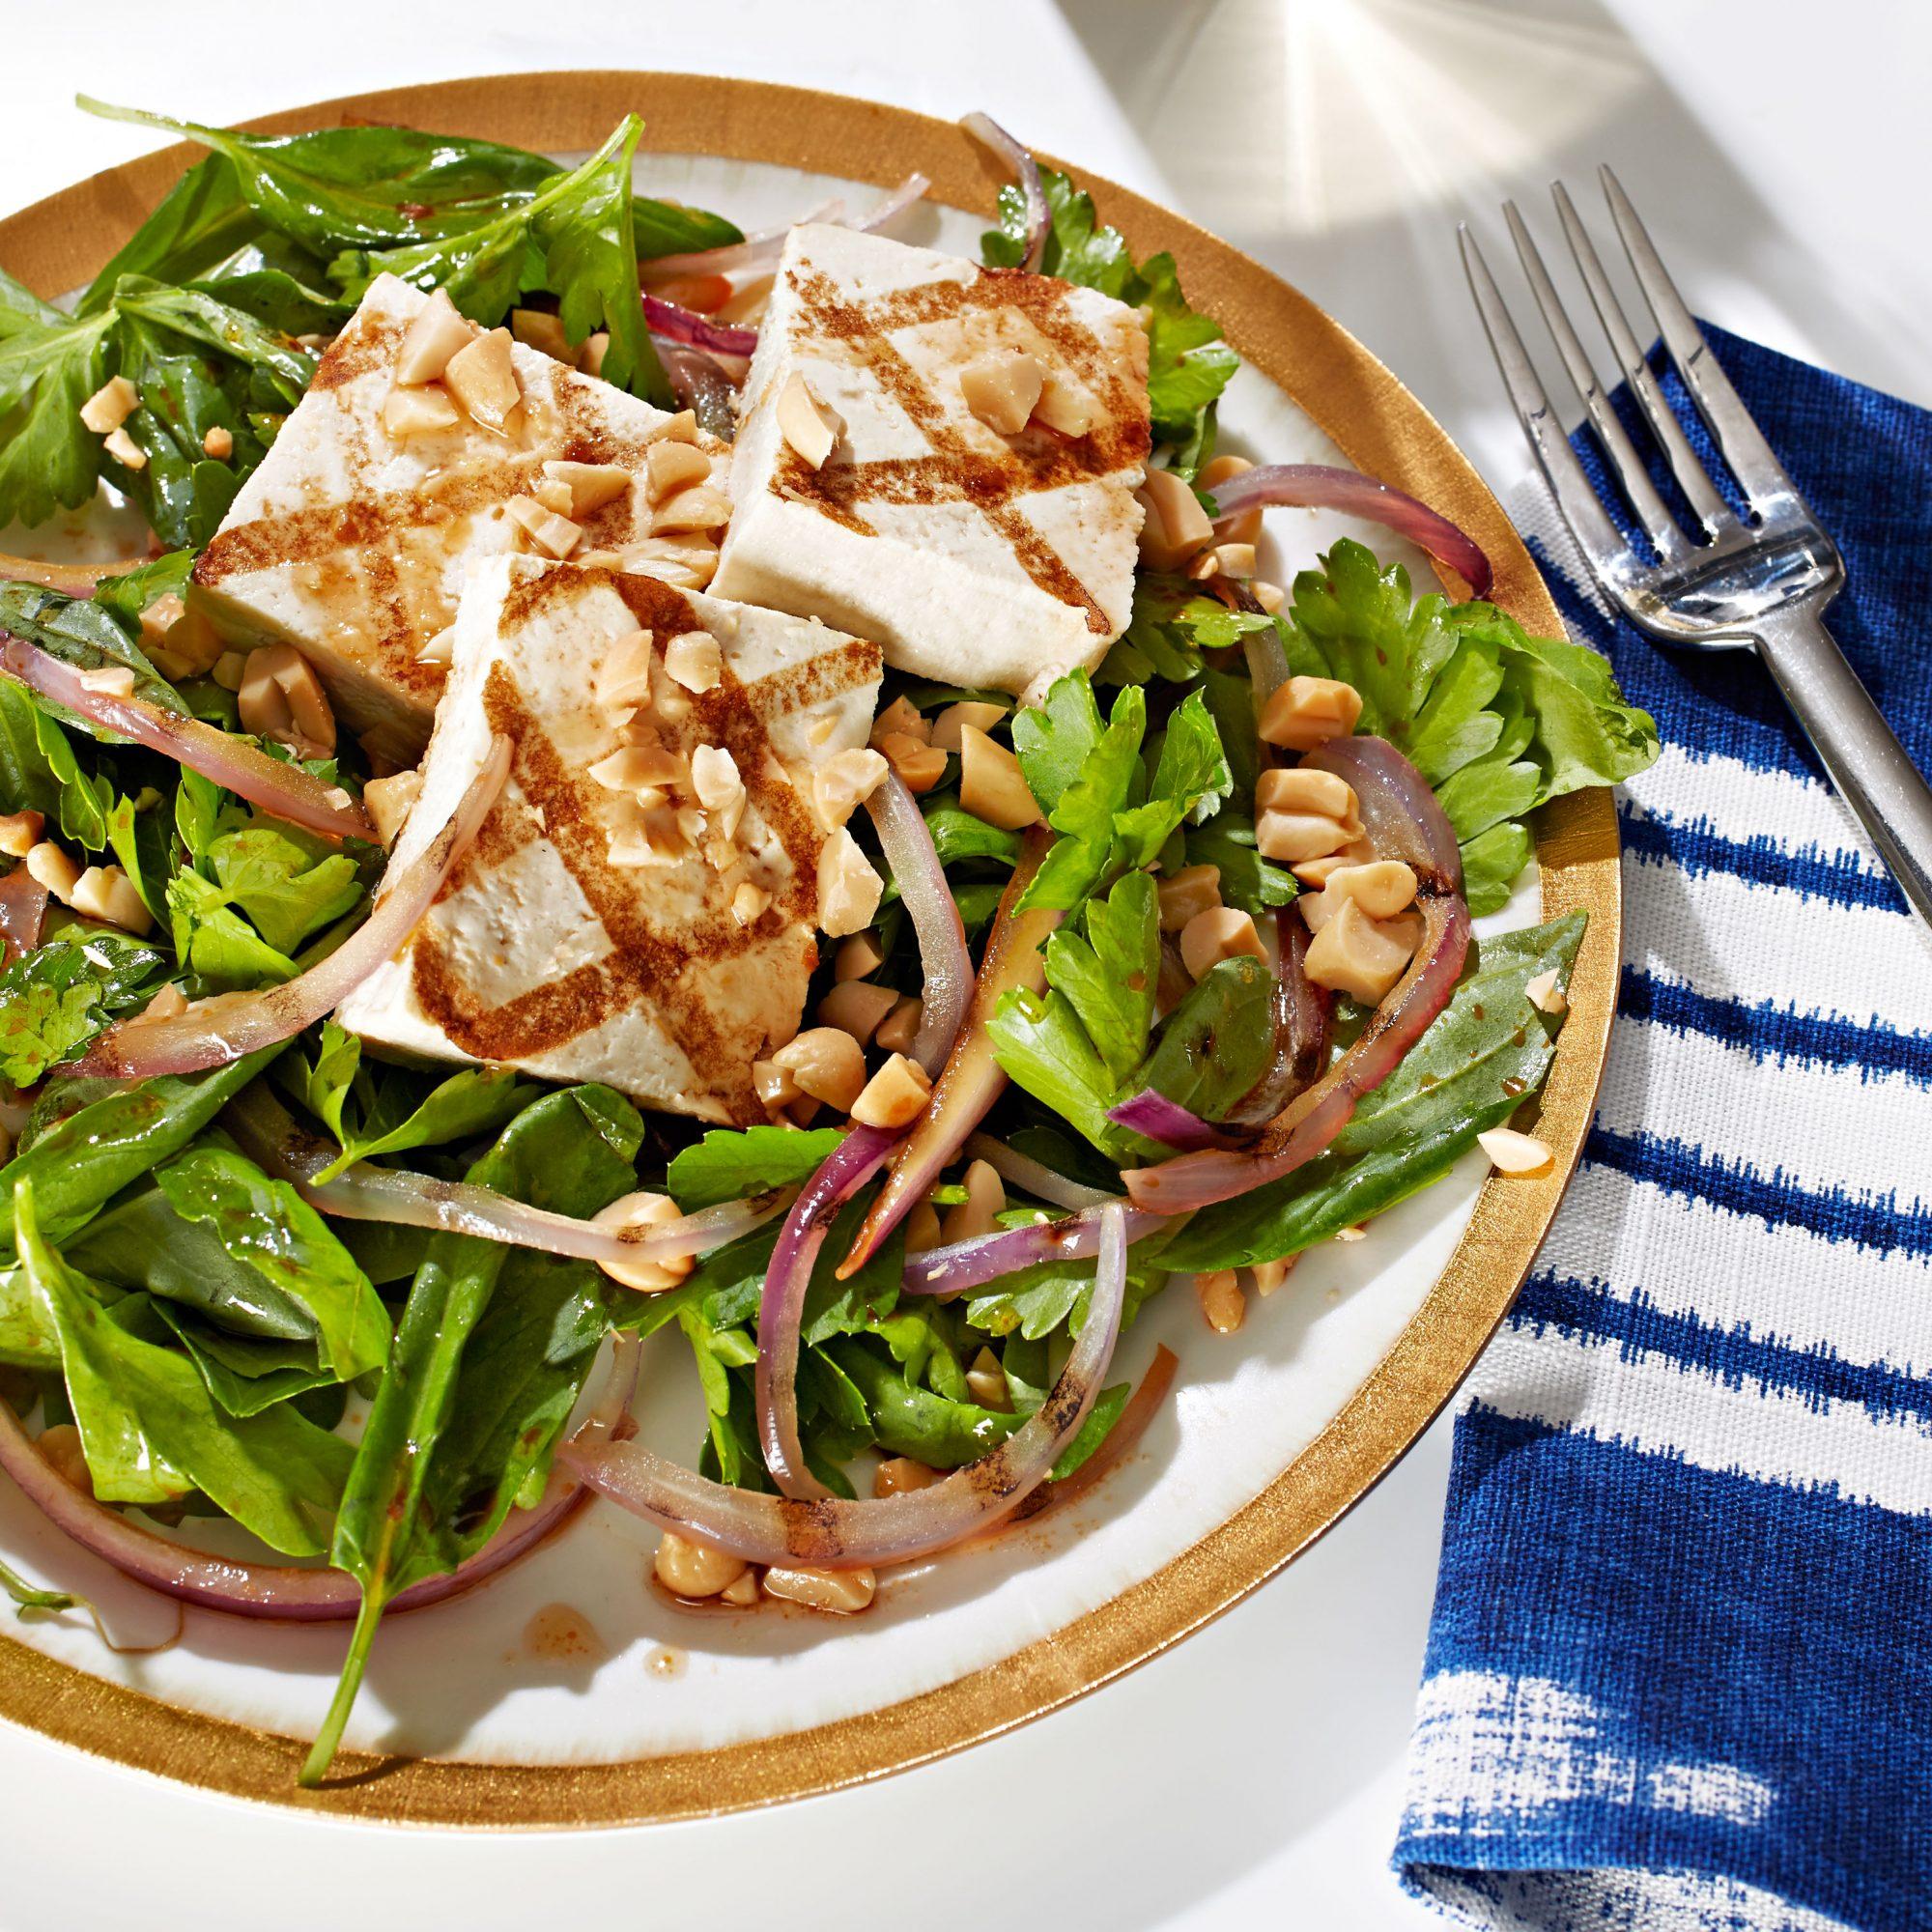 Amanda Cohen's Grilled Tofu & Onion Salad with Sesame-Lime Vinaigrette